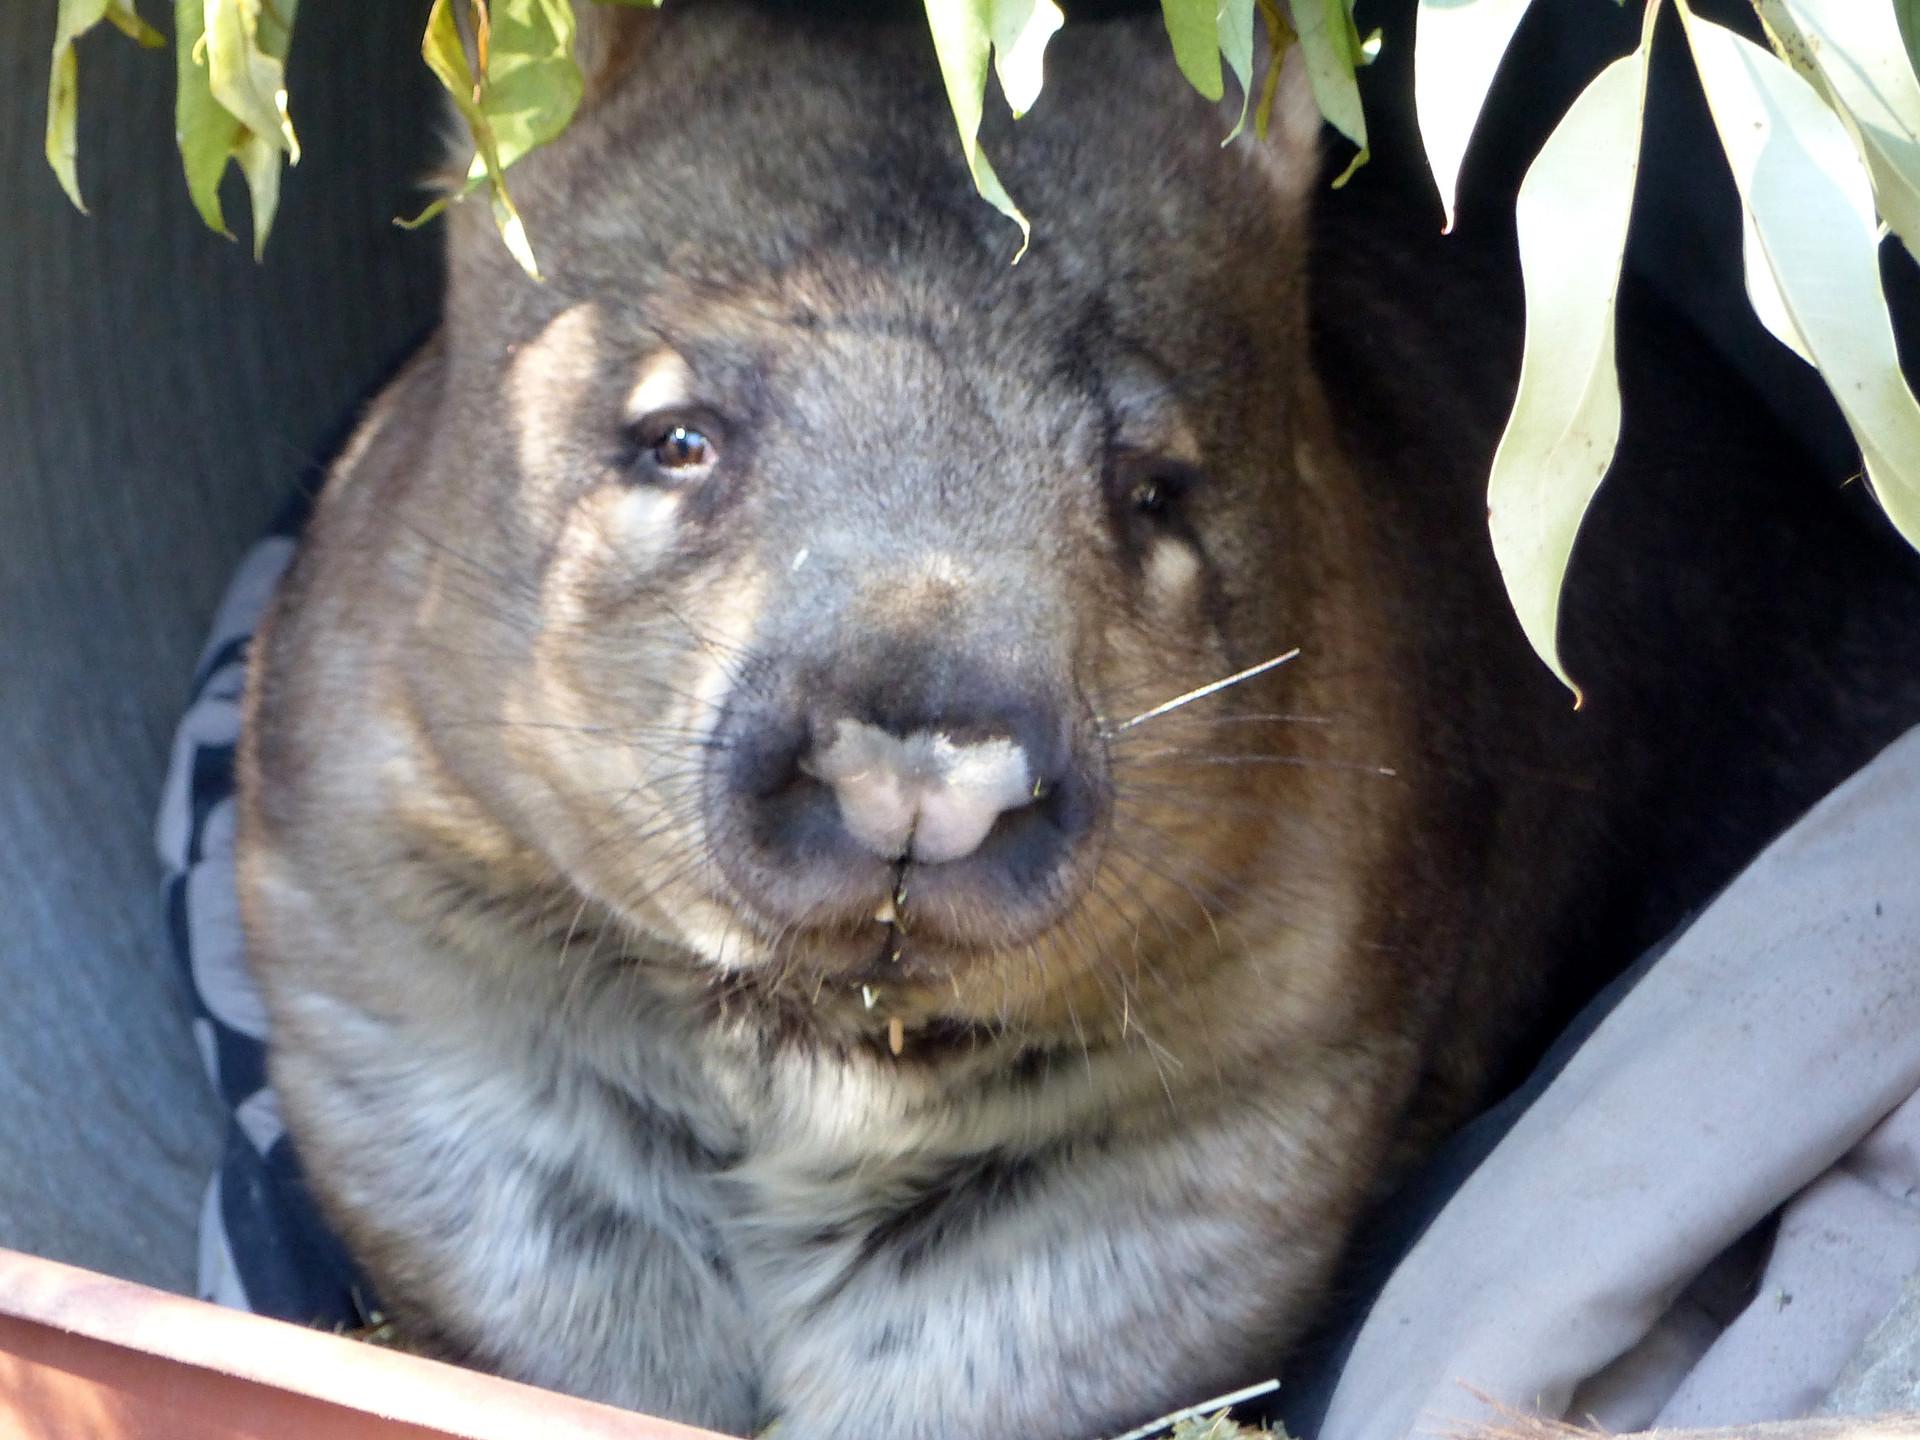 Wombat à narines poilues